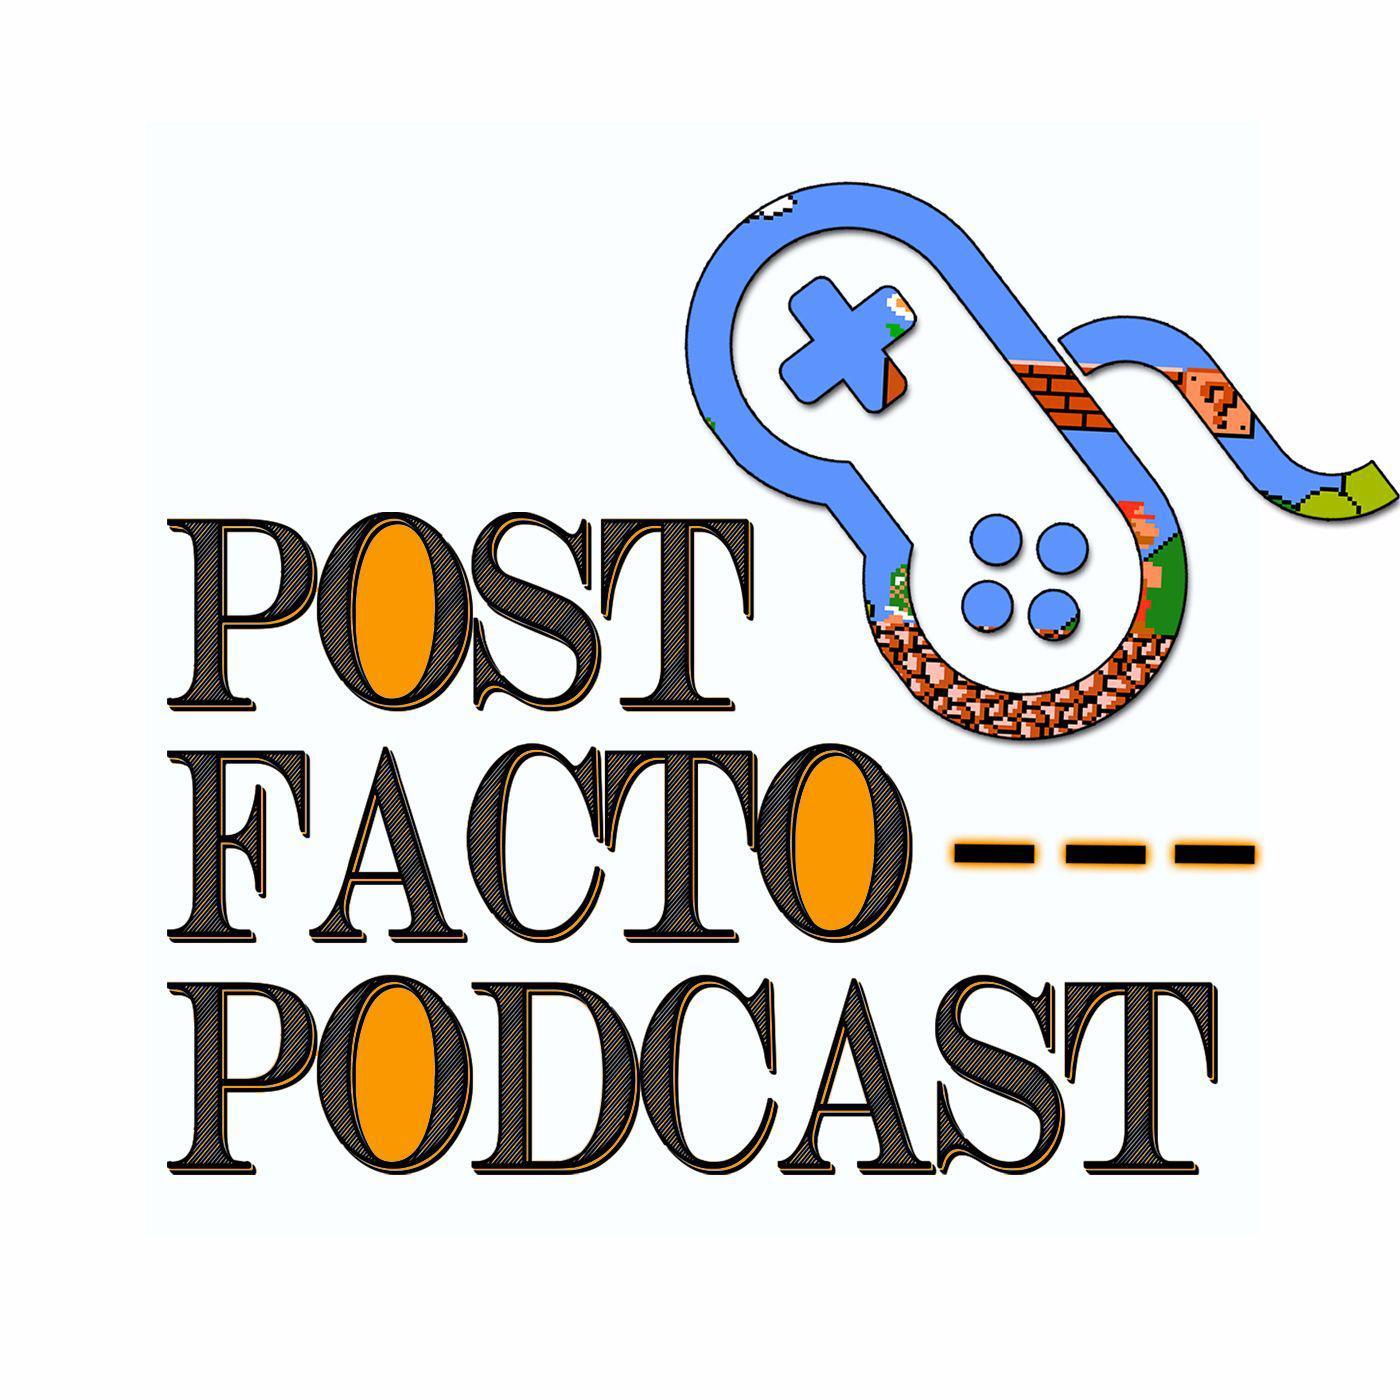 Post Facto Podcast - Steven & Kiiks